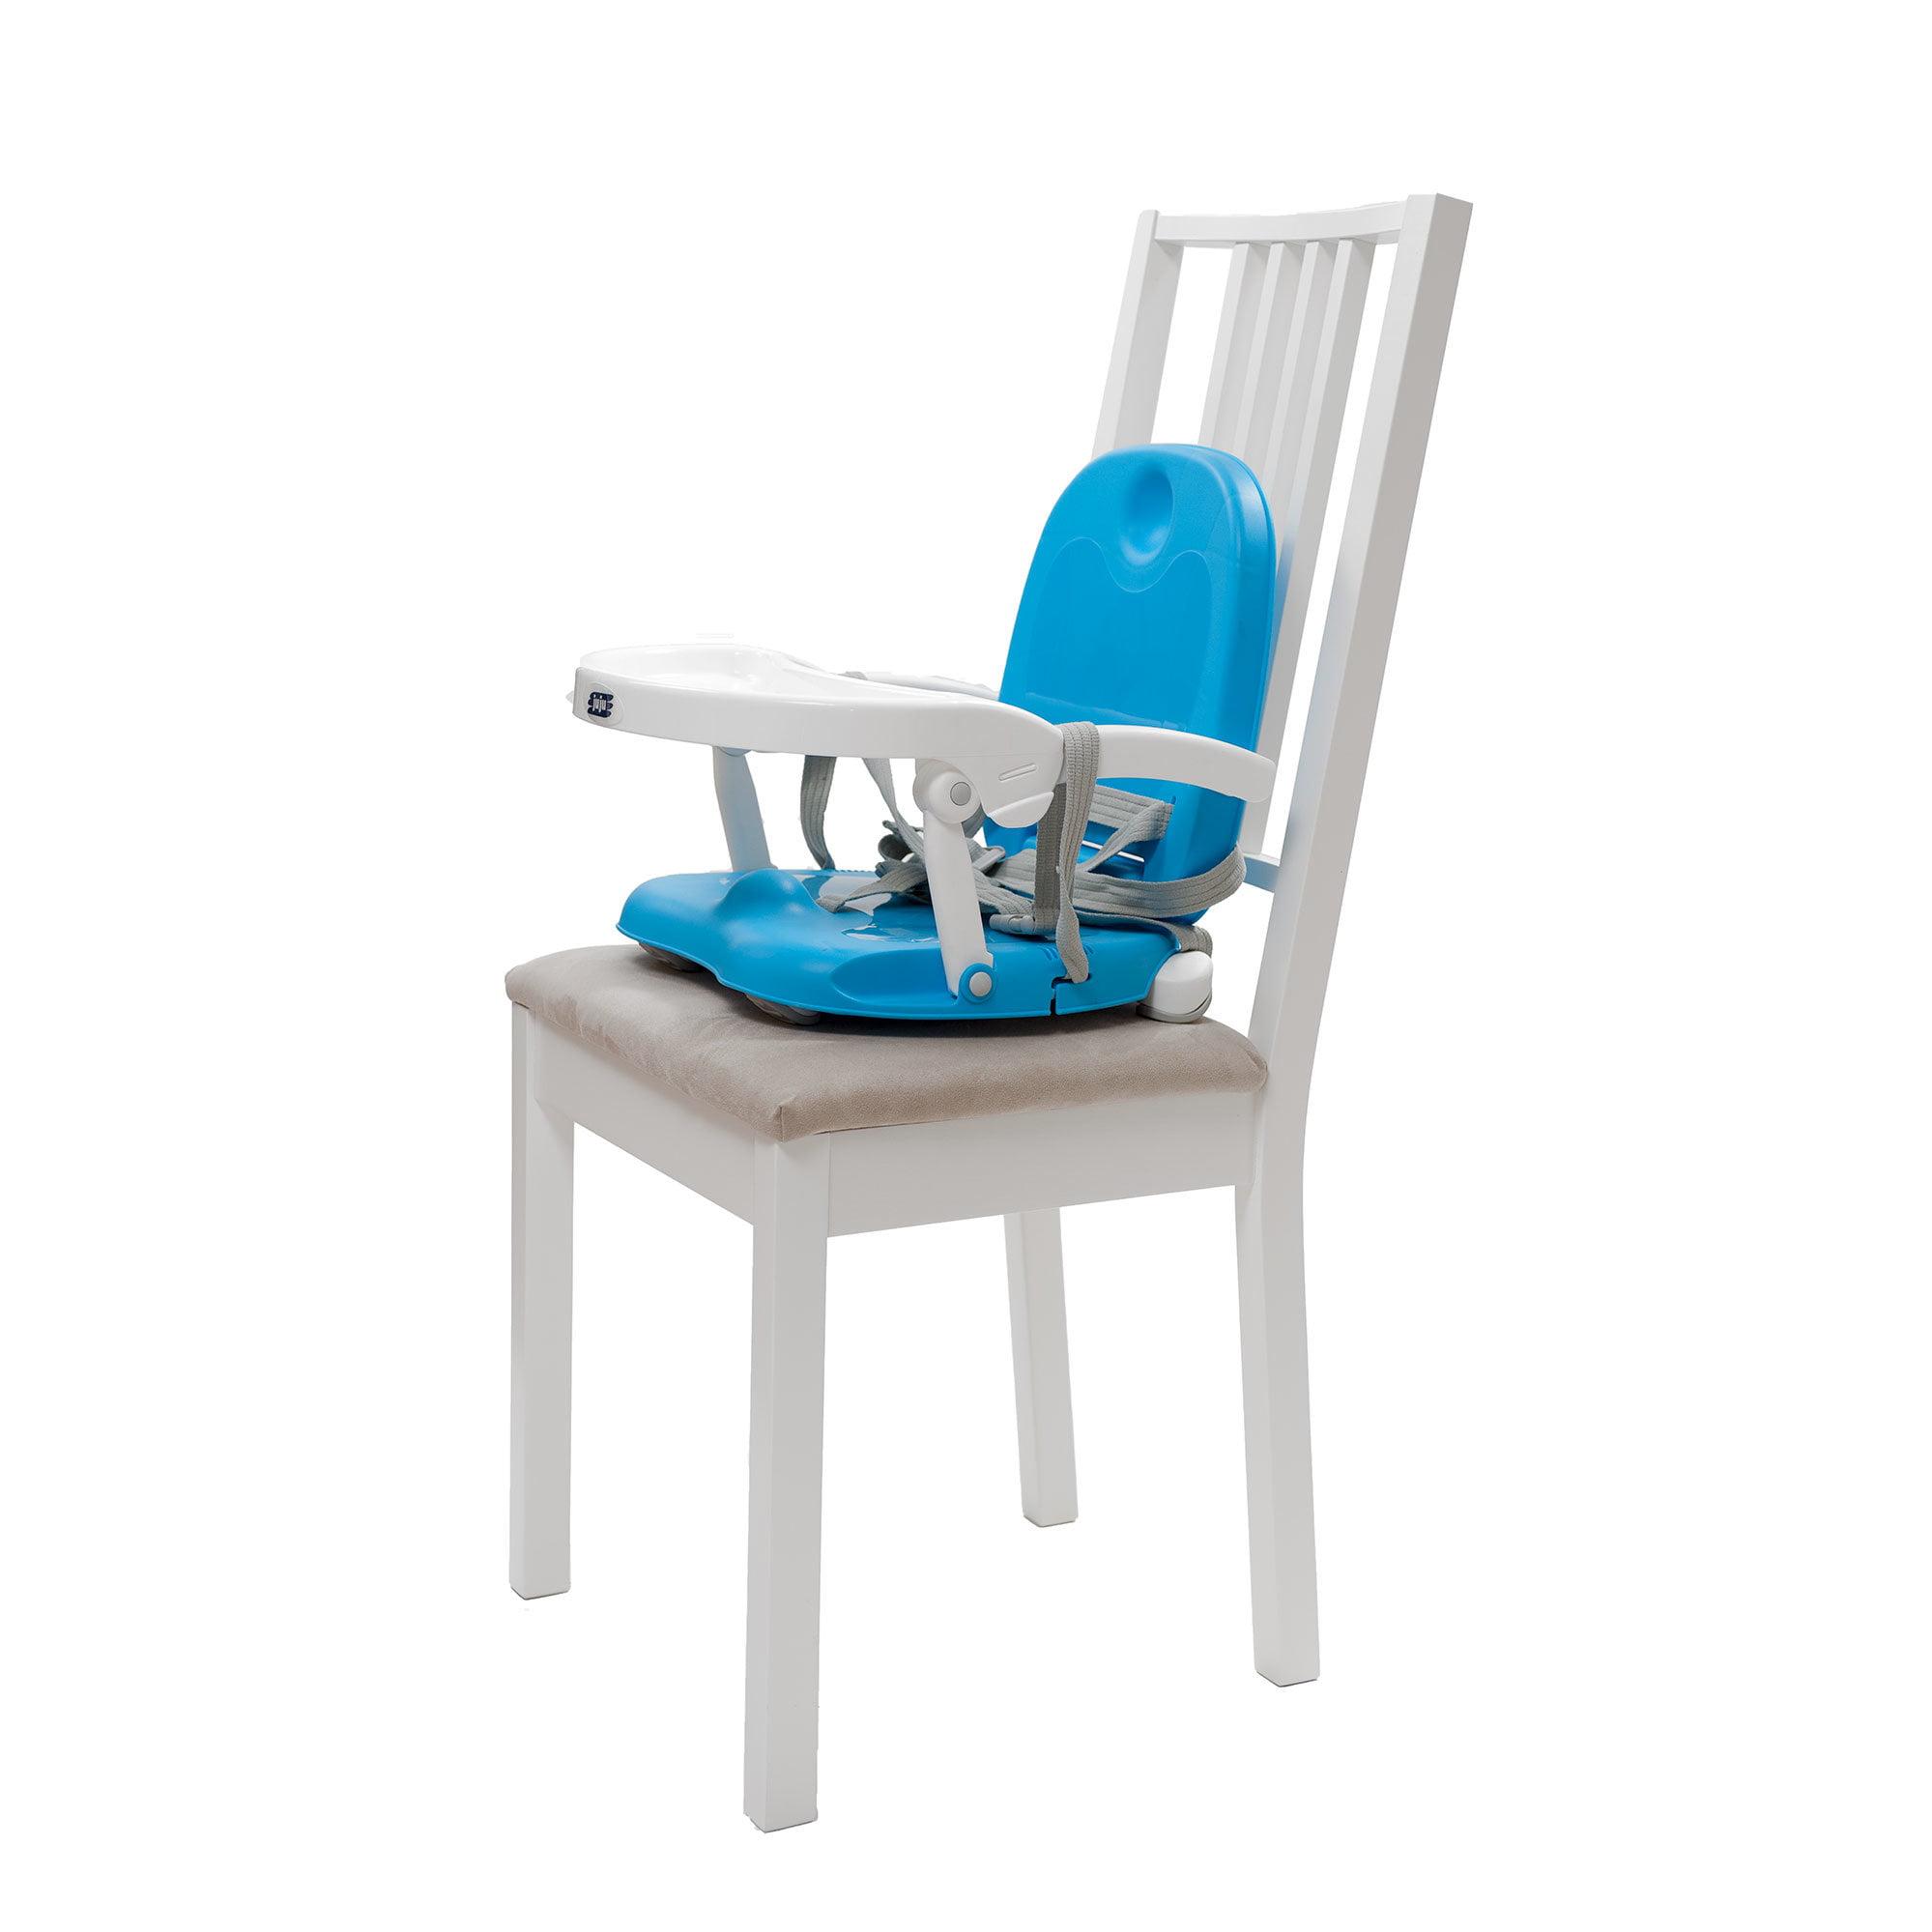 Table Booster Seat Juju Easy Peasy Blue Juju Europe